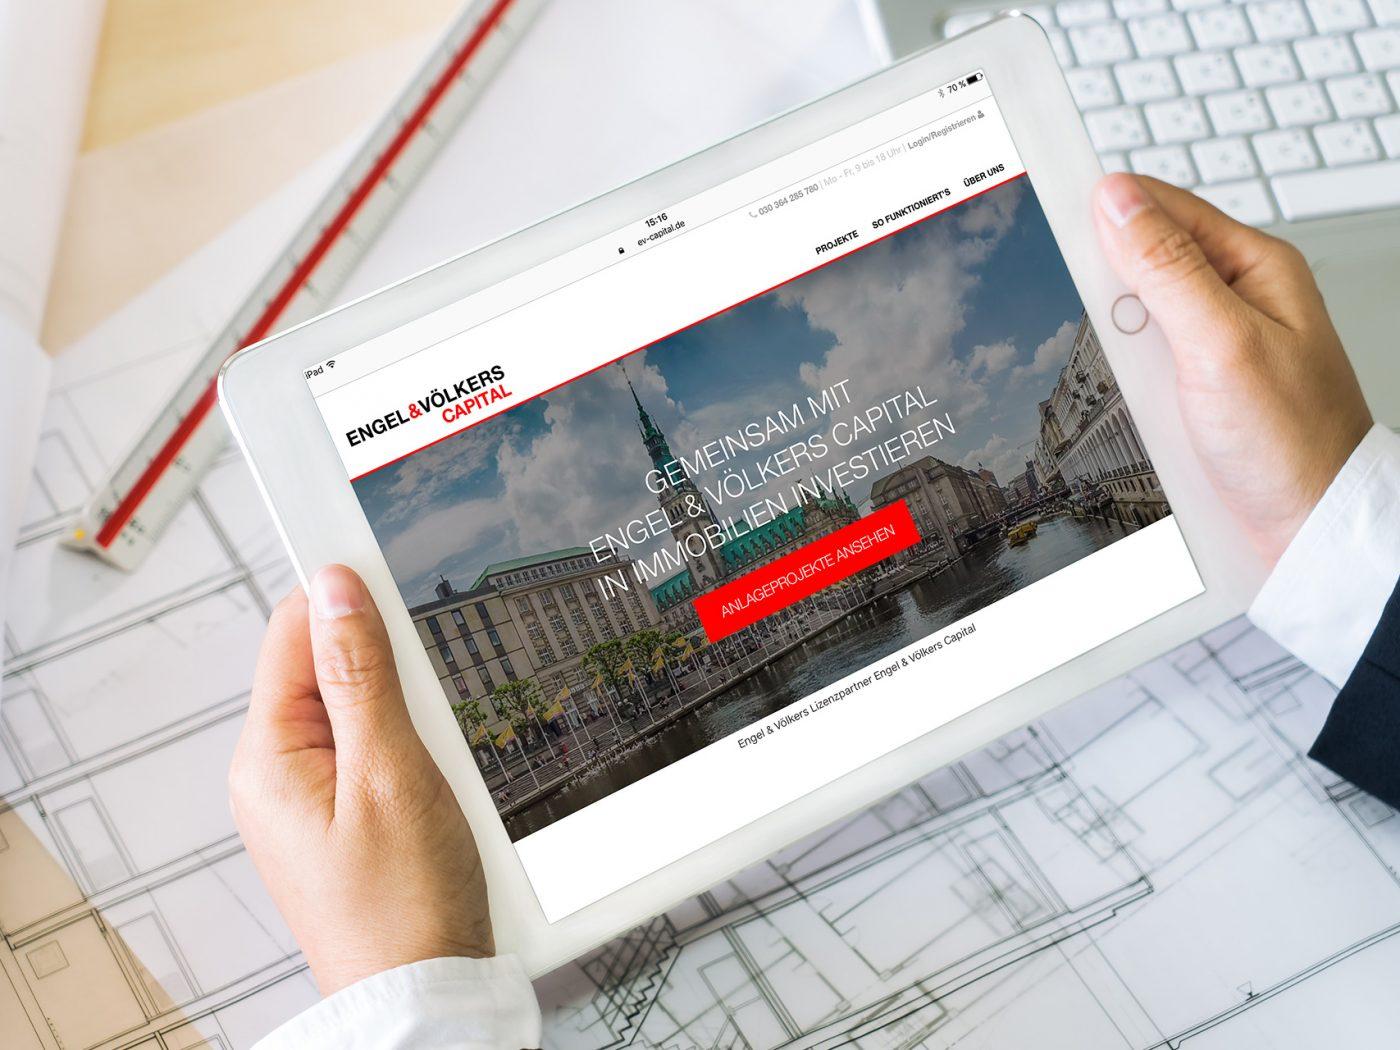 Engel & Völkers Capital Startseite